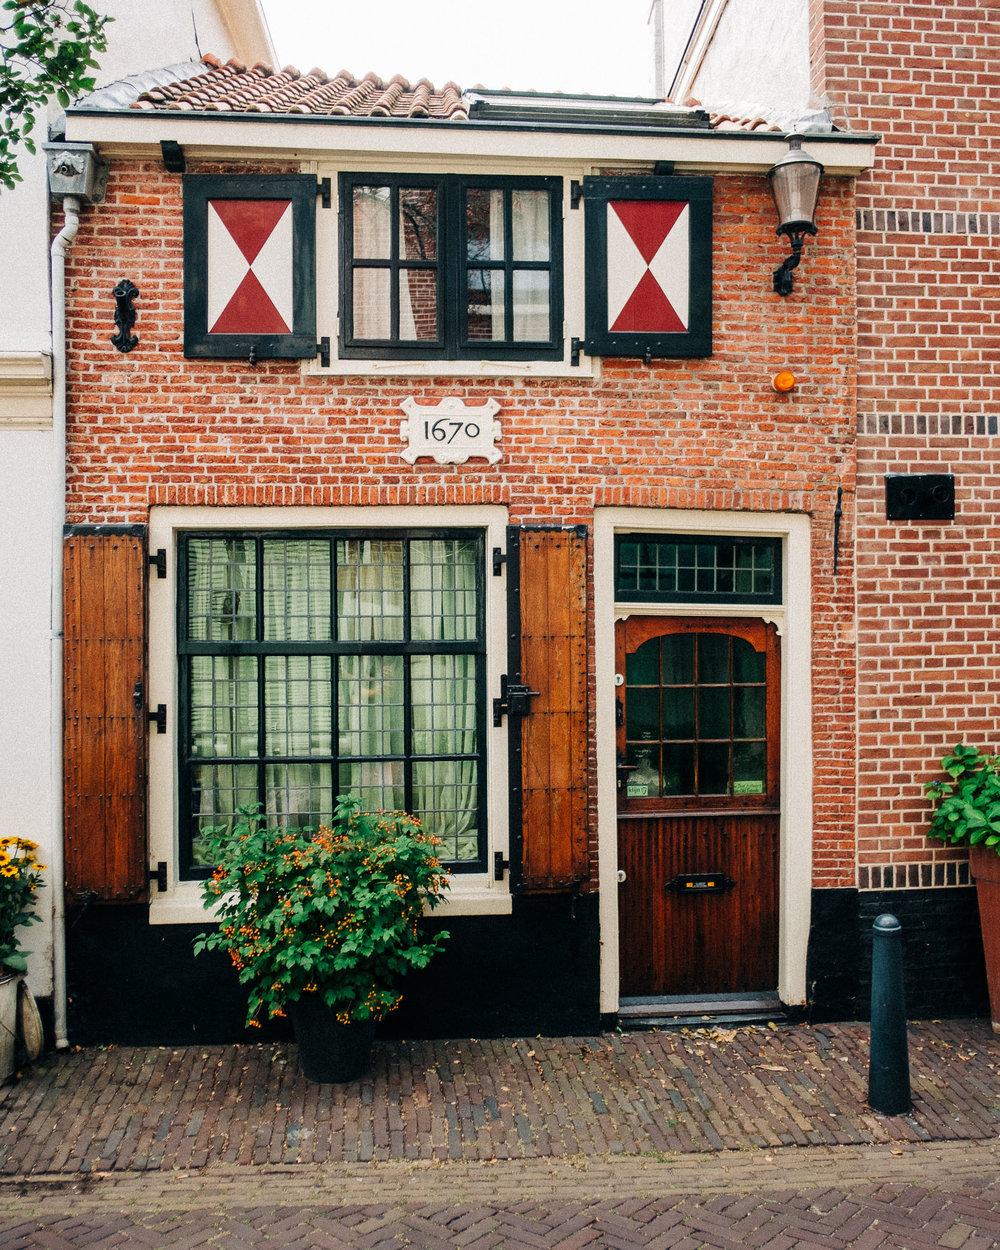 Holland_Urlaub_2018_011.jpg